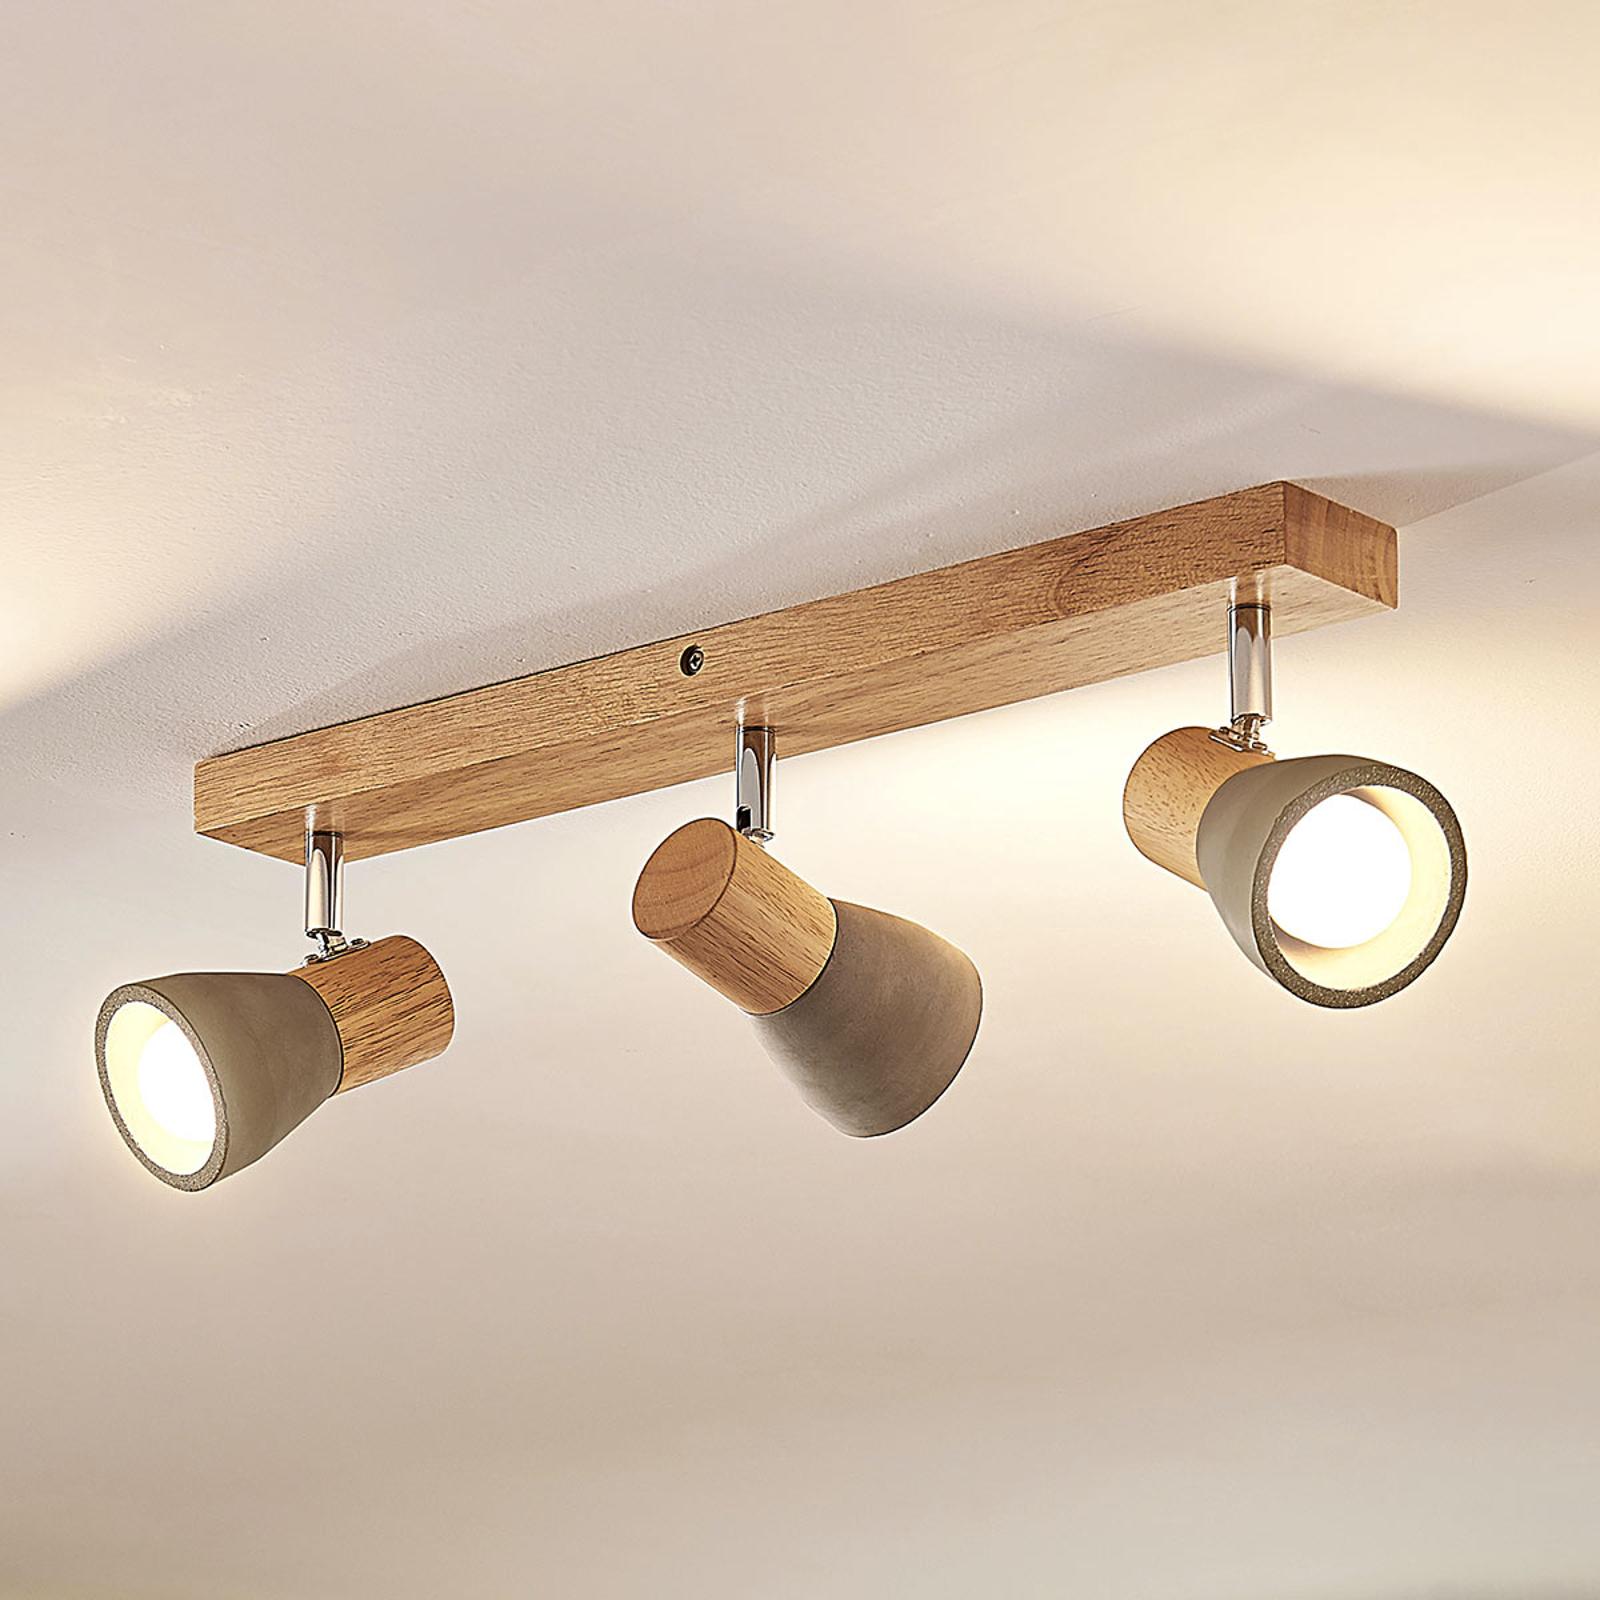 LED-Strahler Filiz aus Holz und Beton, 3-fl., lang